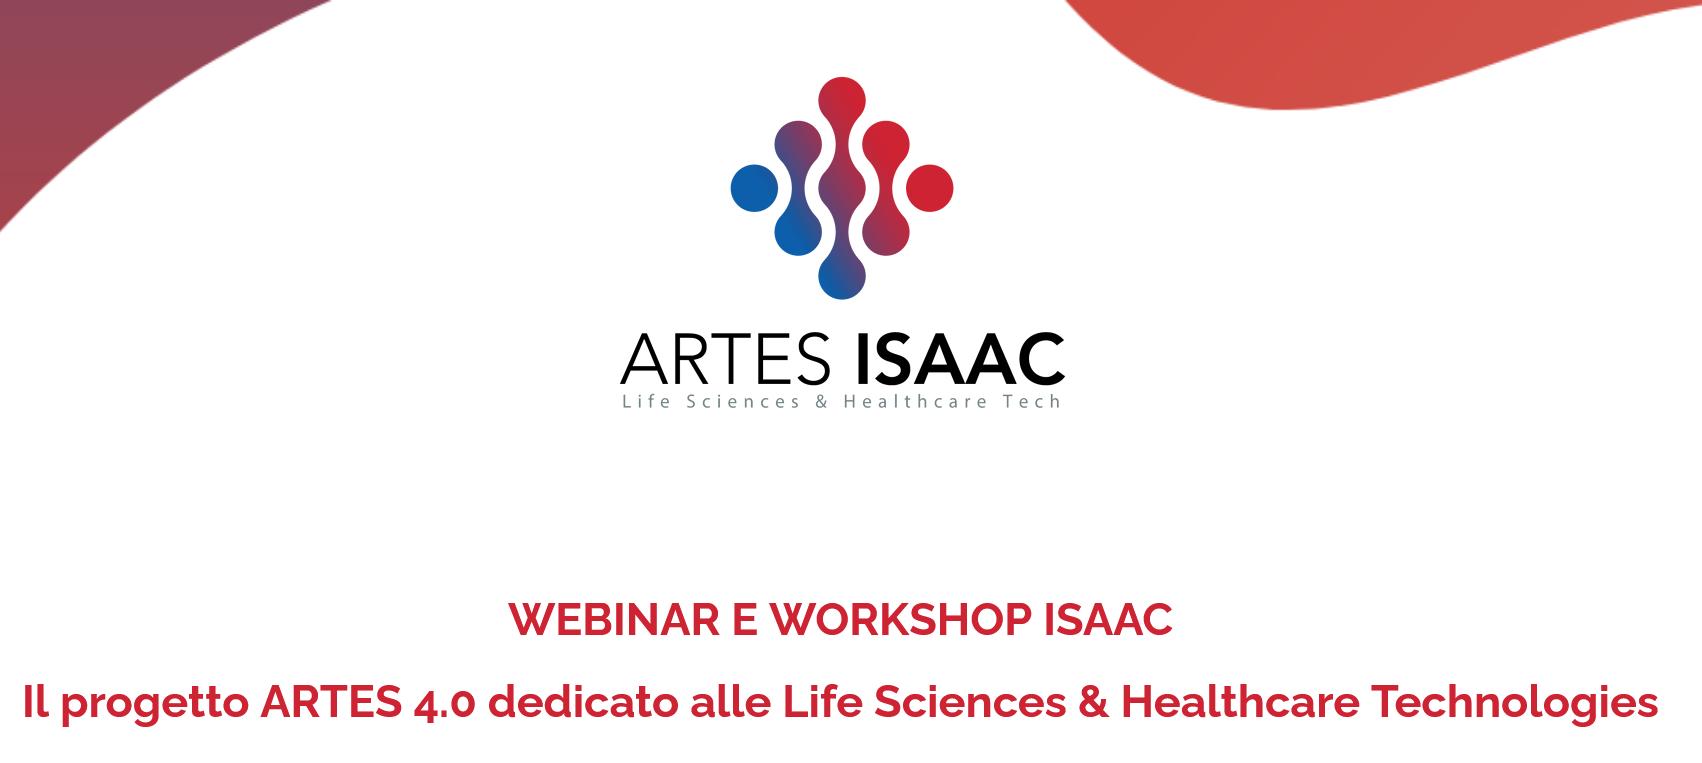 WEBINAR E WORKSHOP ISAAC. Il progetto ARTES 4.0 dedicato alle Life Sciences & Healthcare Technologies